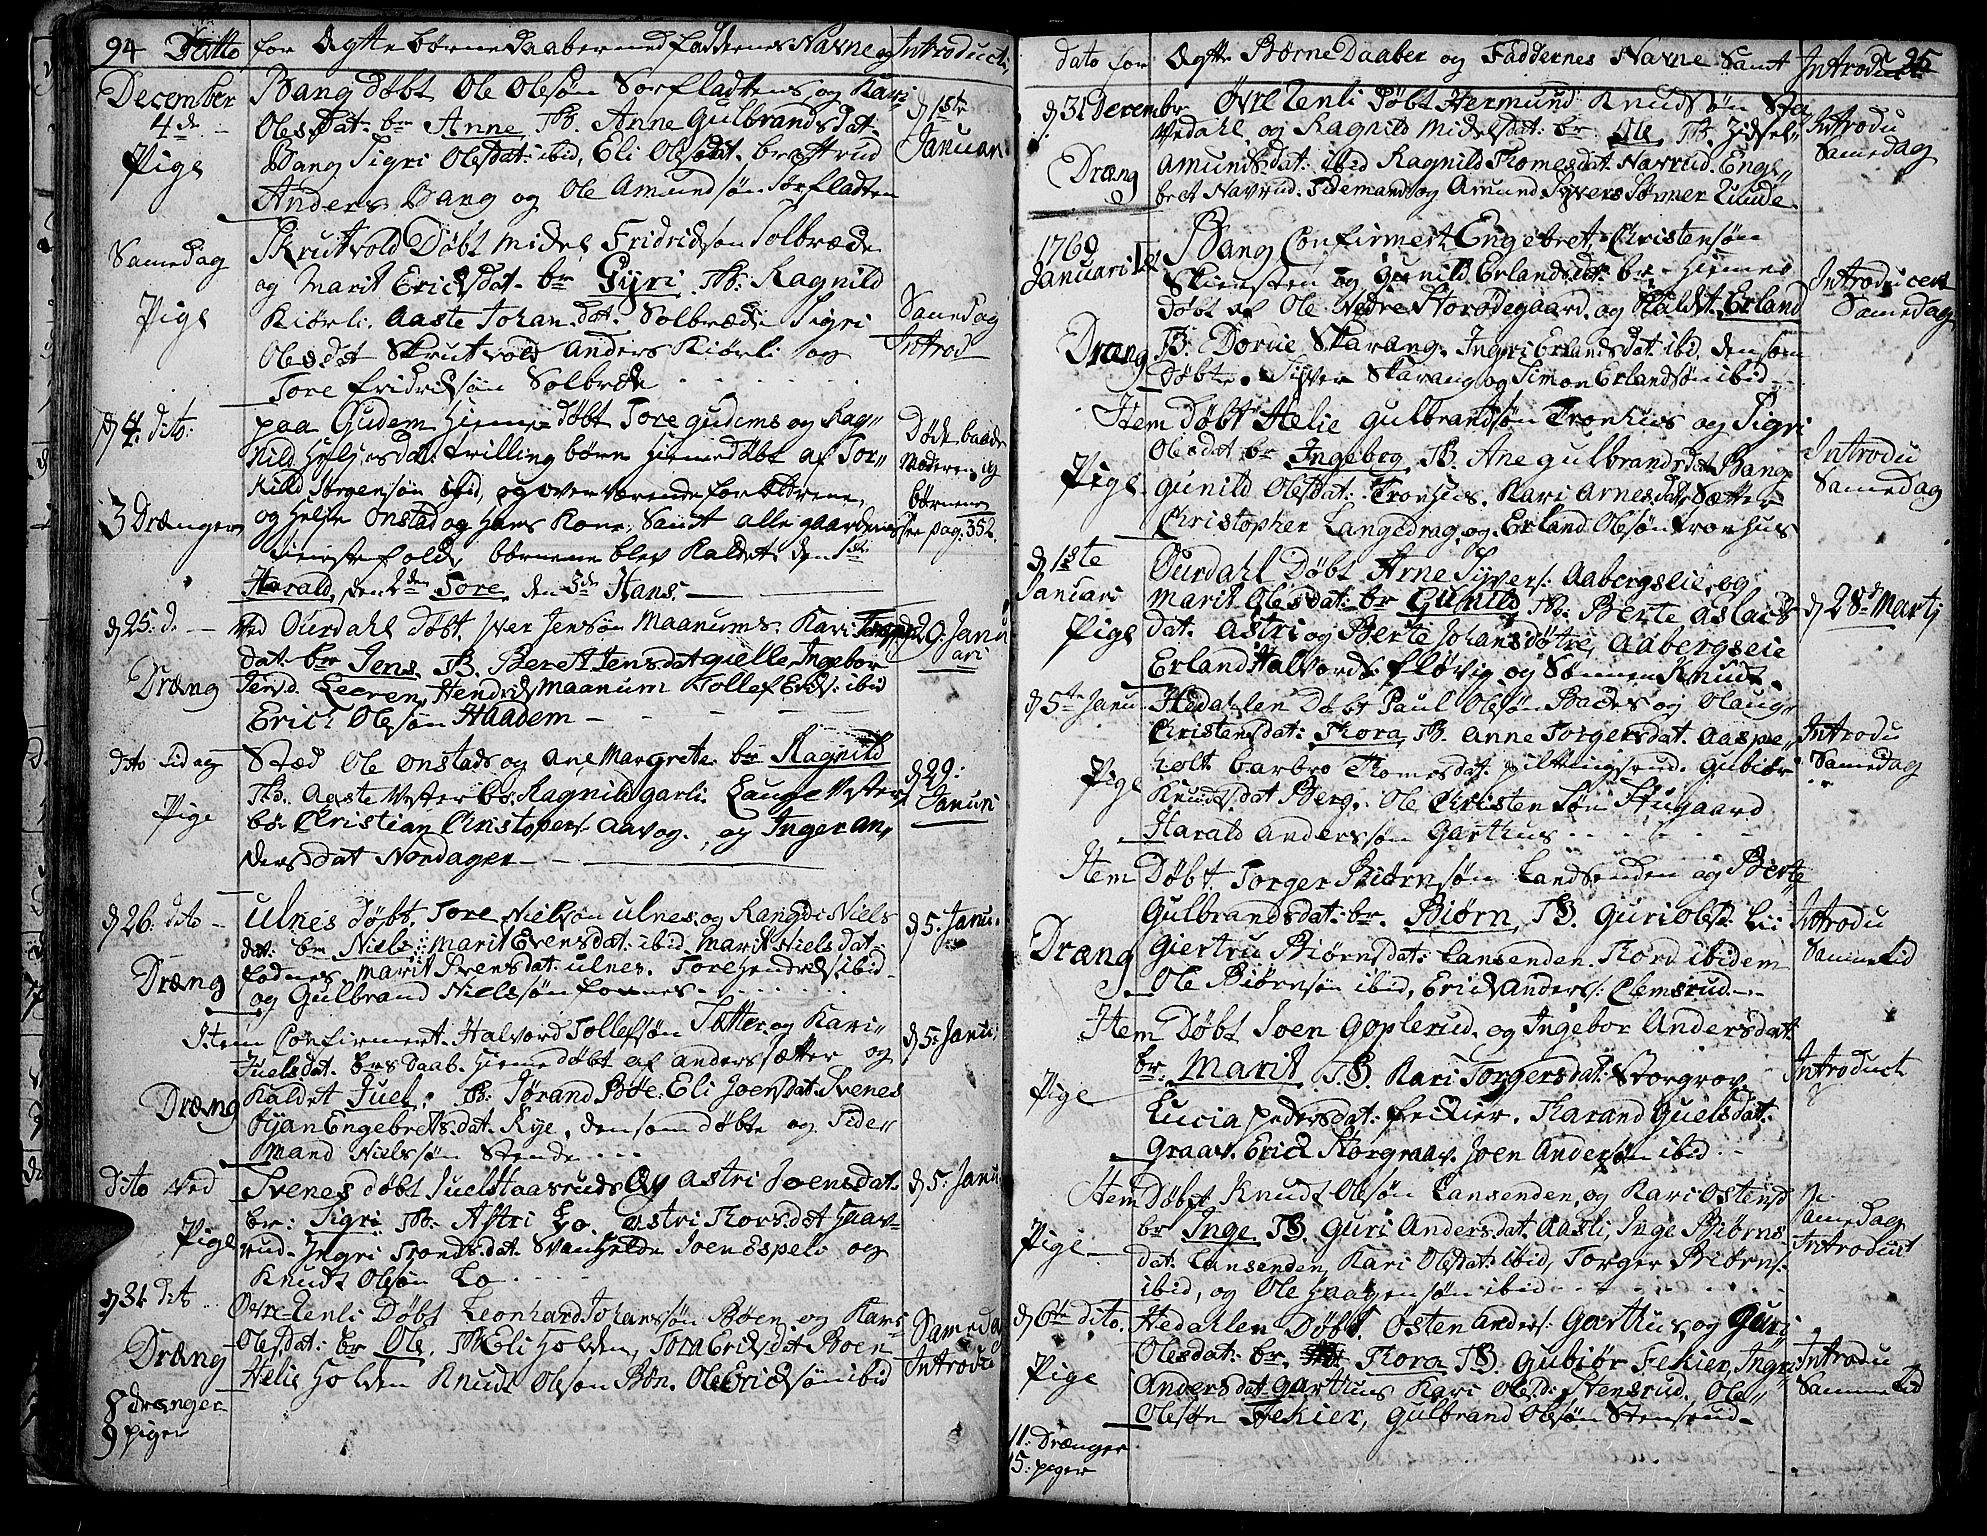 SAH, Aurdal prestekontor, Ministerialbok nr. 5, 1763-1781, s. 94-95